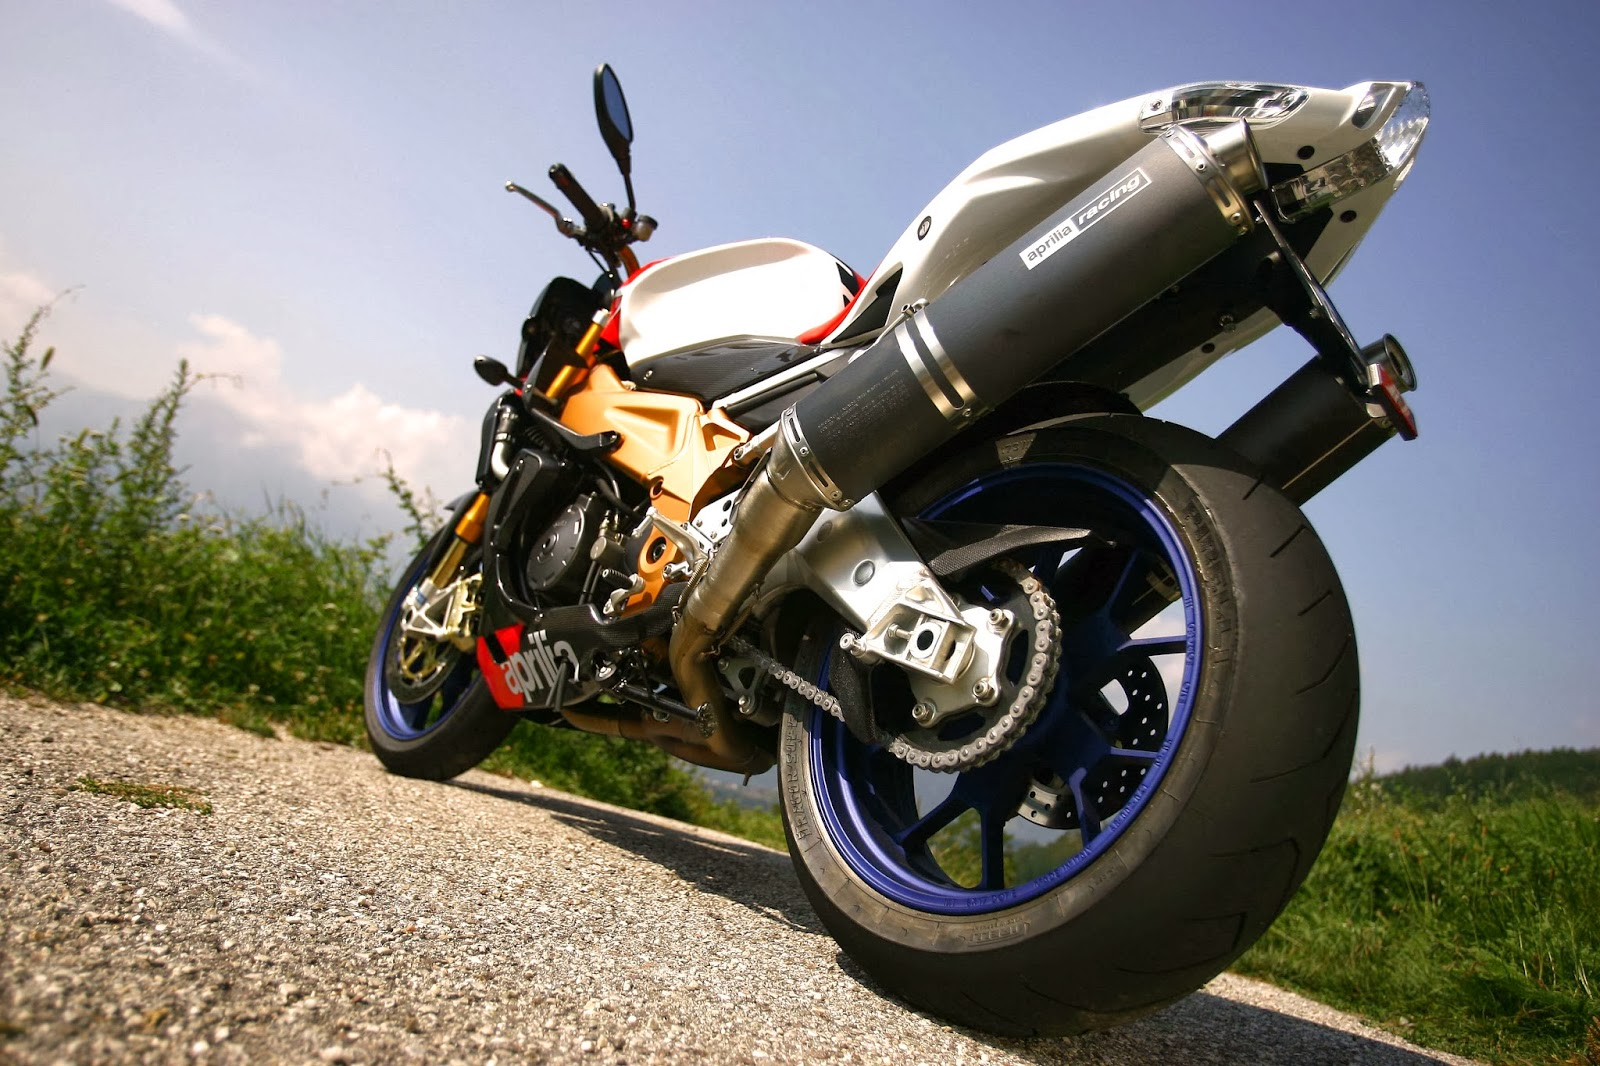 motor sports full hd - photo #19